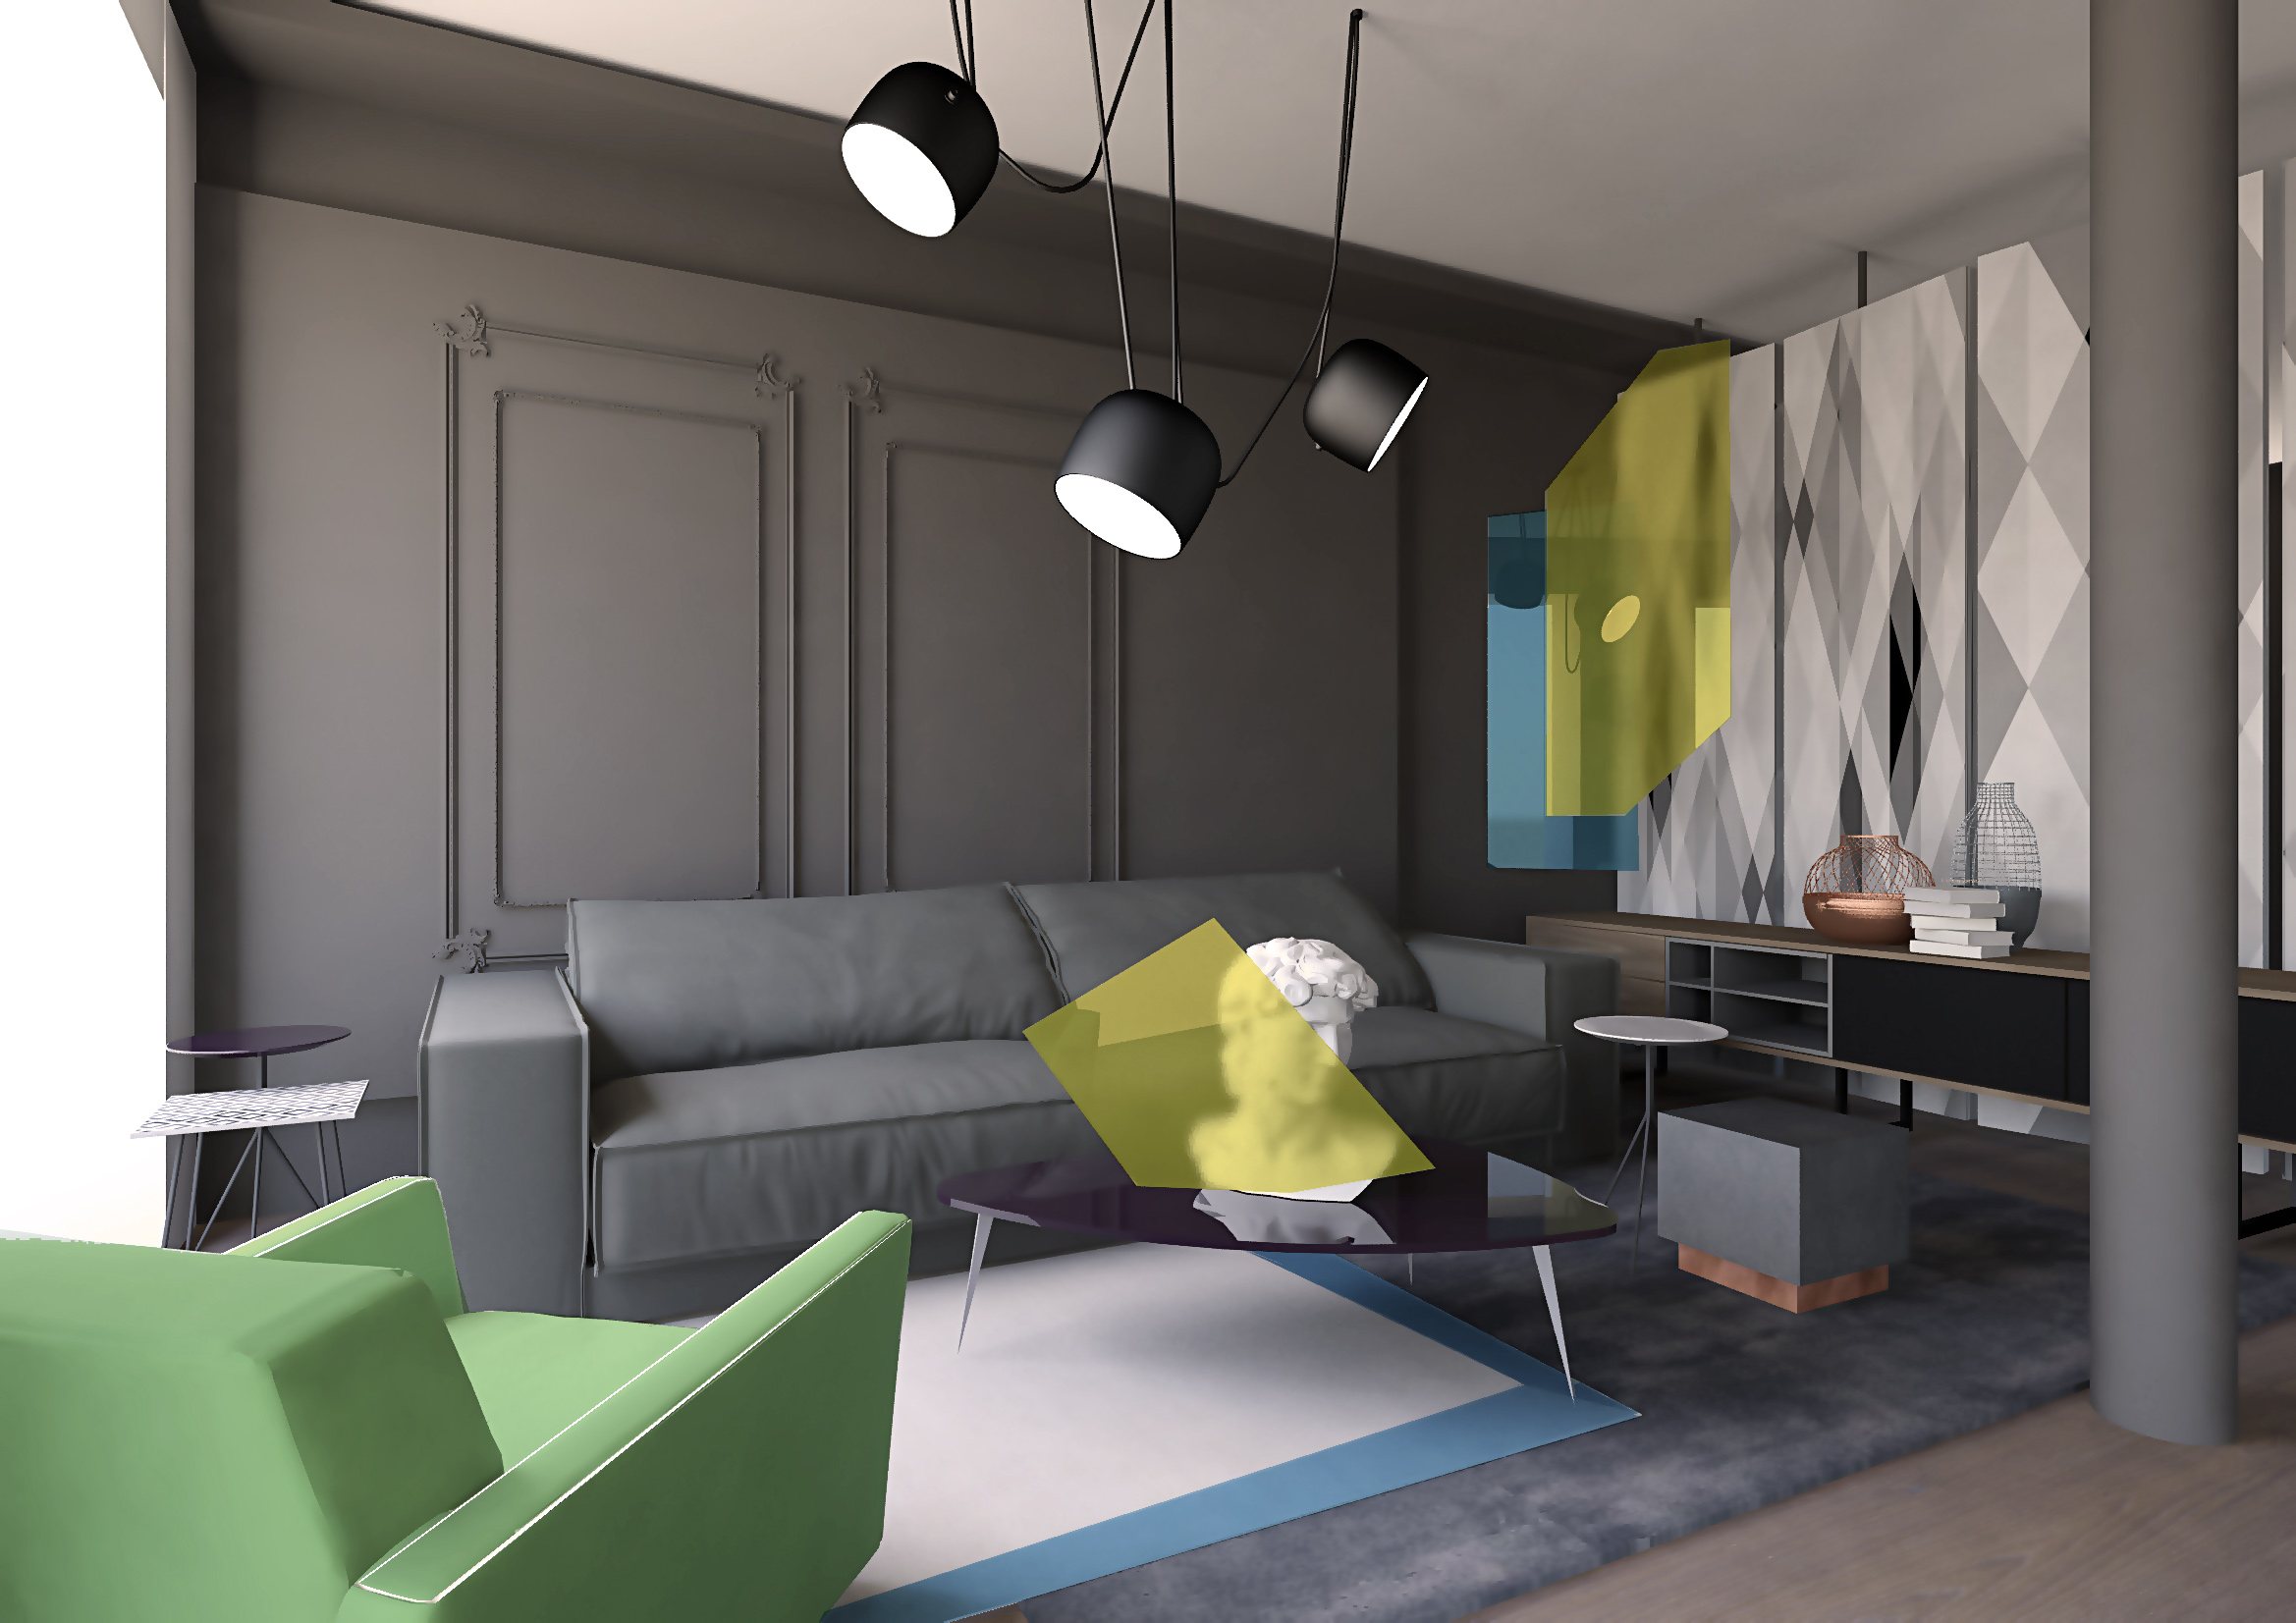 femmes de design claude cartier d coration. Black Bedroom Furniture Sets. Home Design Ideas